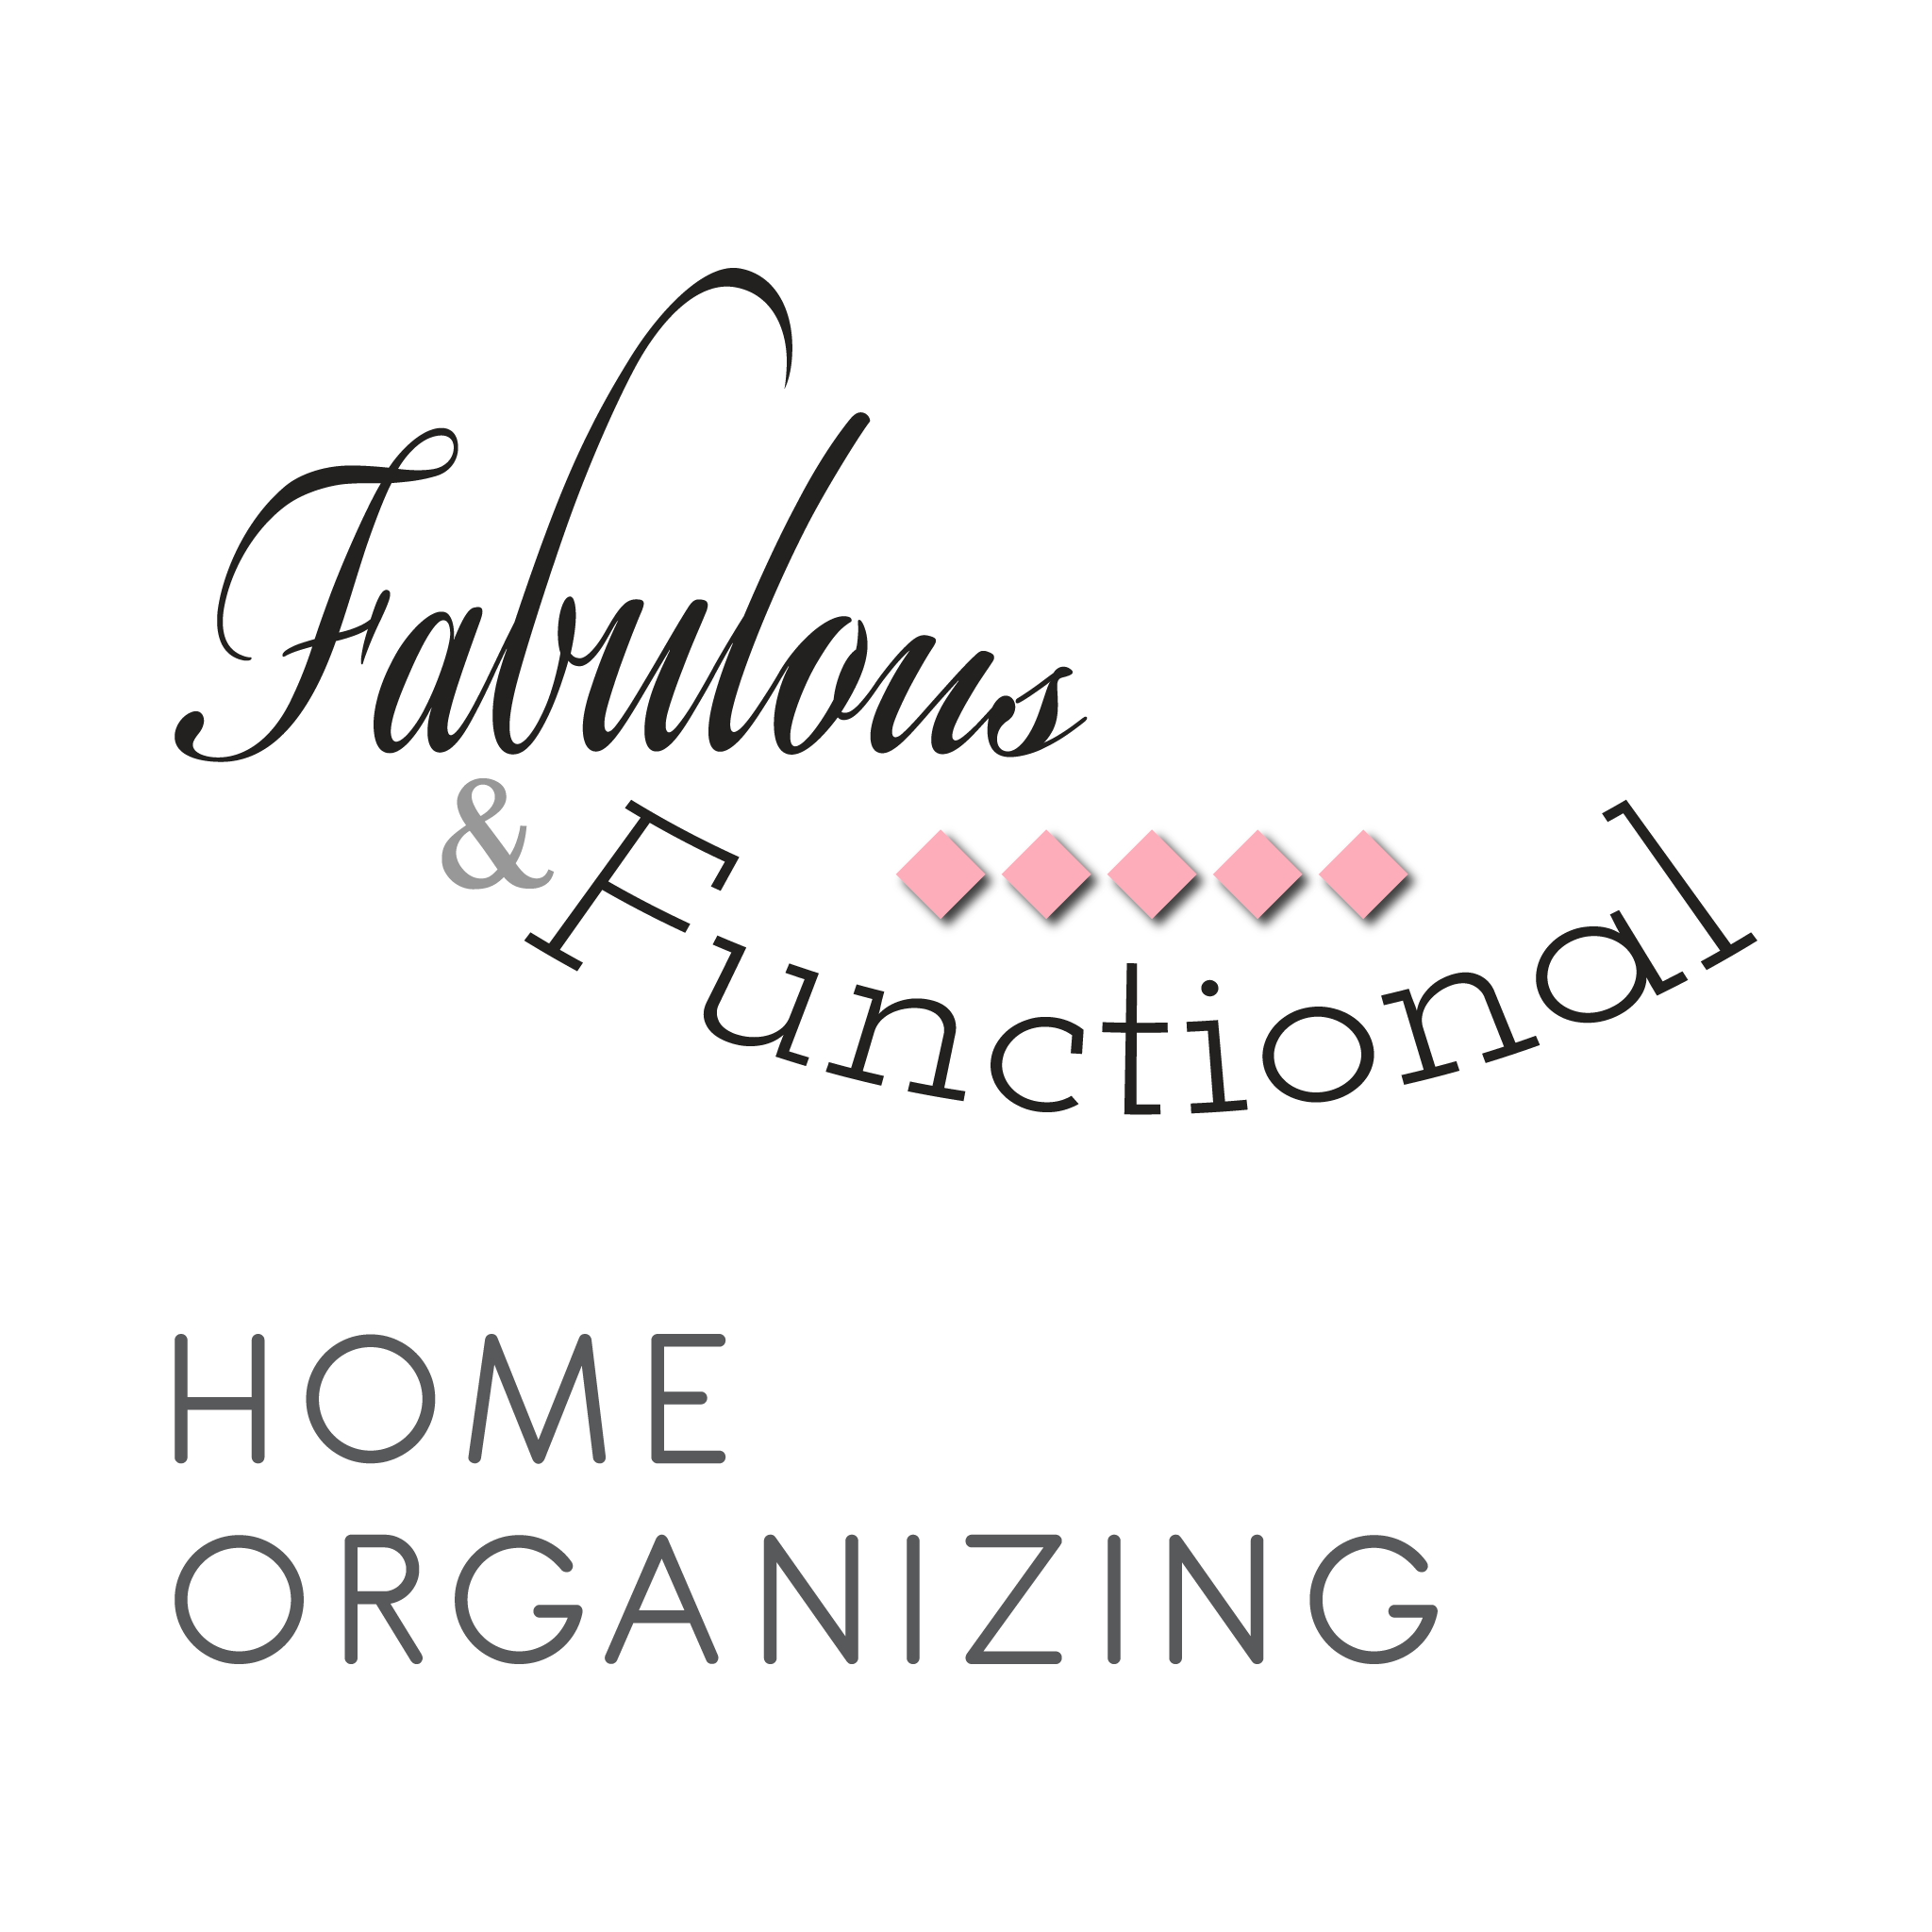 Fabulous & Functional Home Organizing